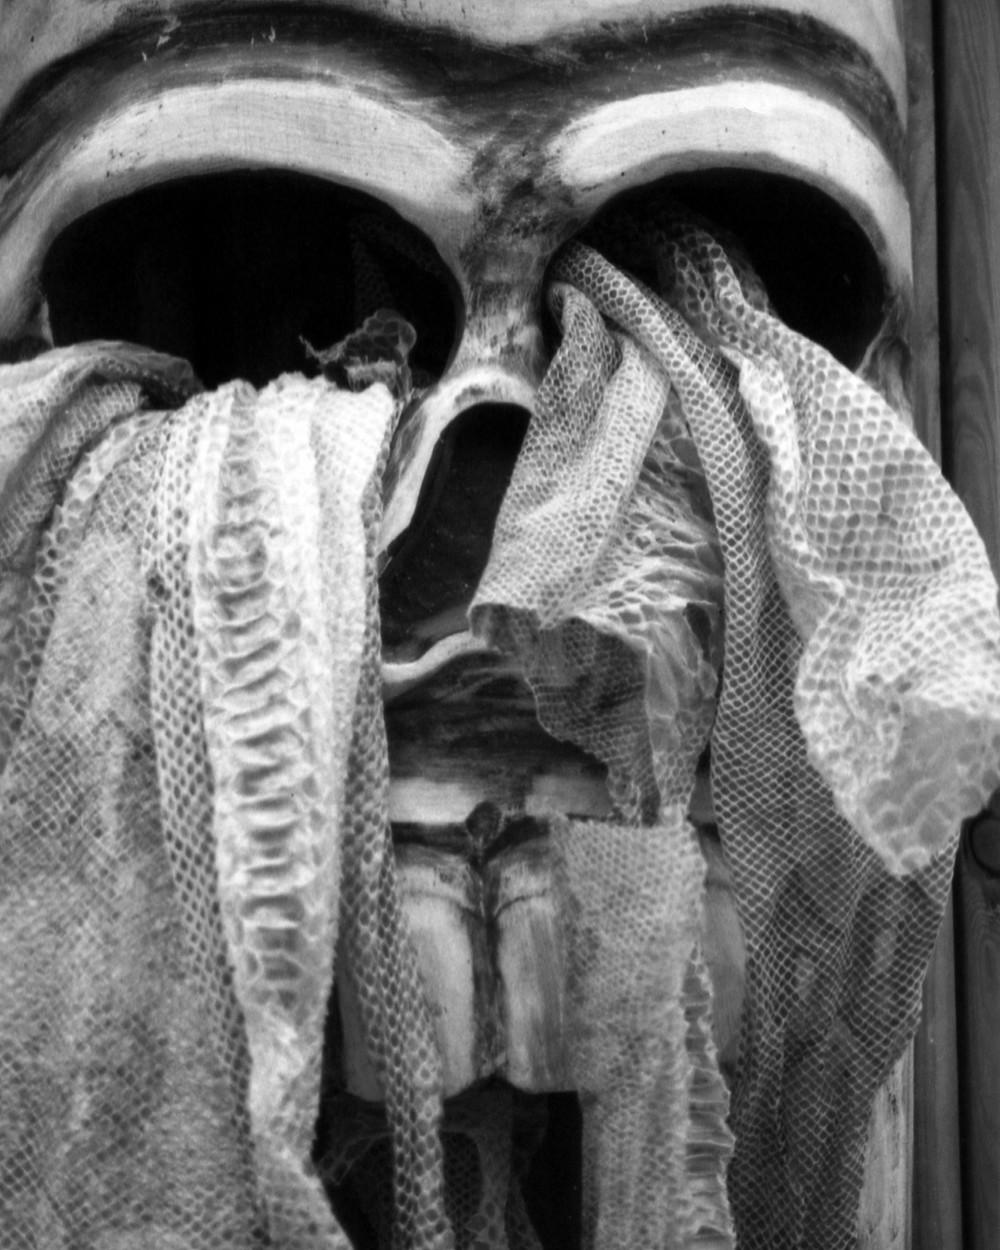 Skull; Pentax 110 Auto Super/70mm f2.8/Lomography Orca 100